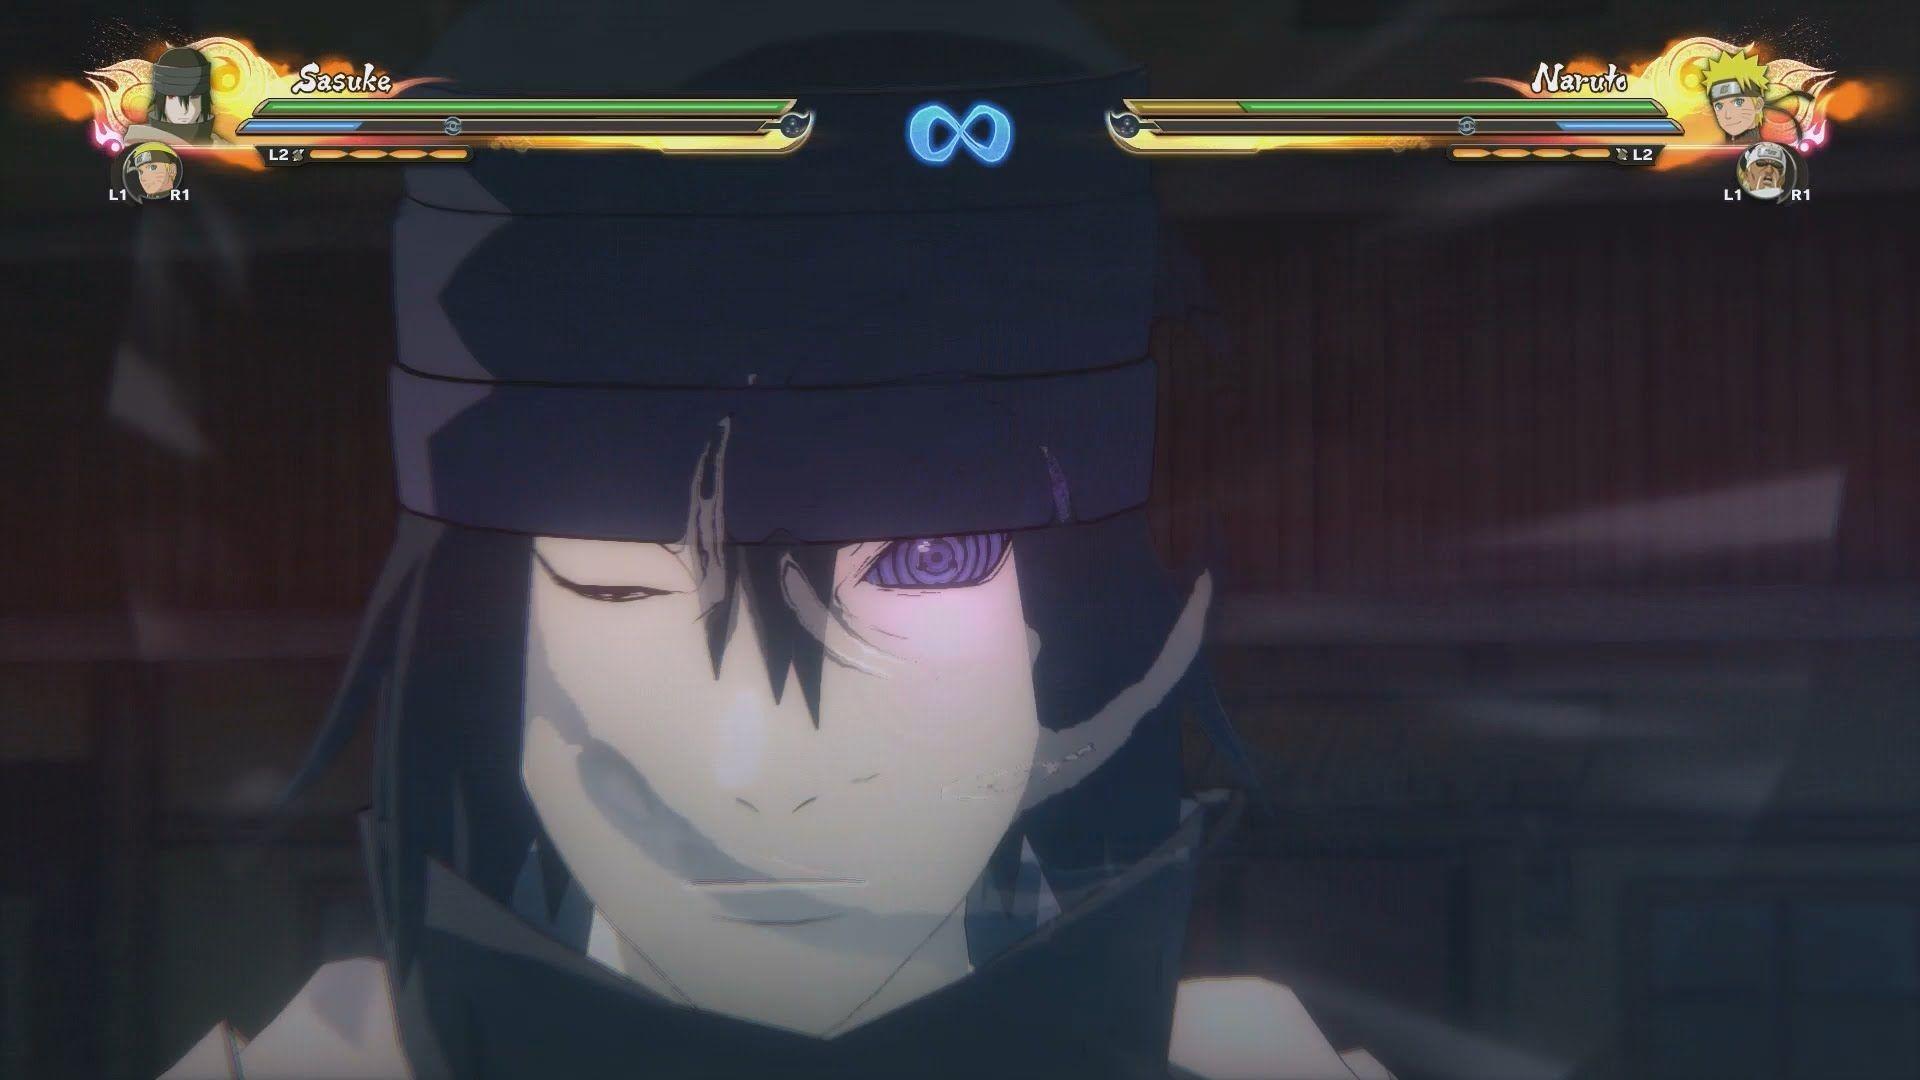 Itachi Hd Wallpaper 1080p Sasuke The Last Wallpapers Wallpaper Cave